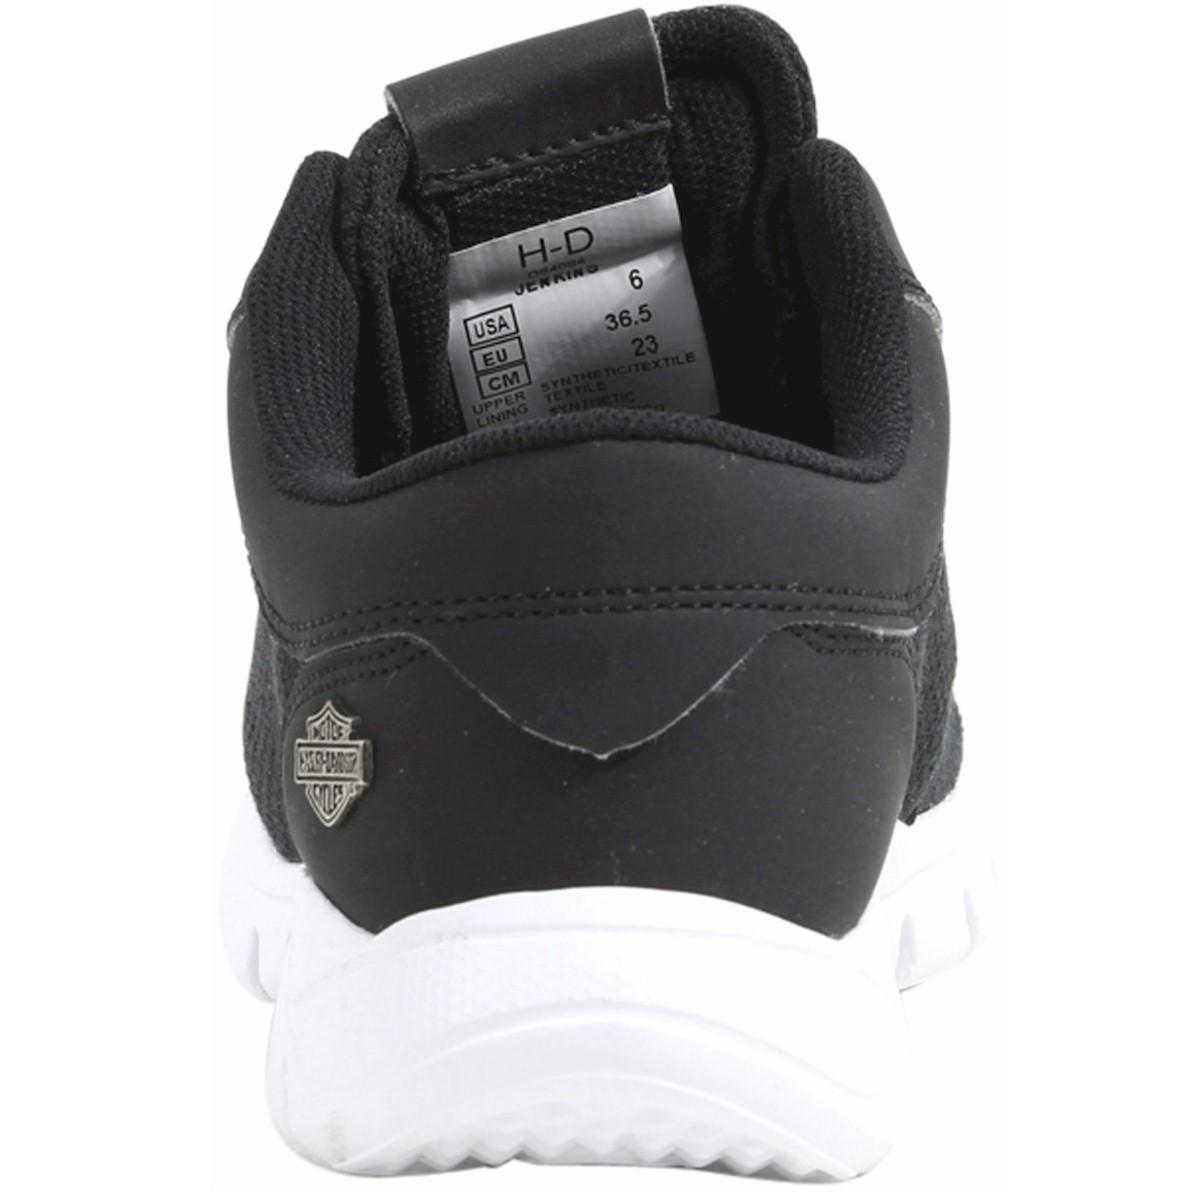 c8d7e921da3f ... Women s Jenkins Sneakers Shoes by Harley-Davidson. 1234567